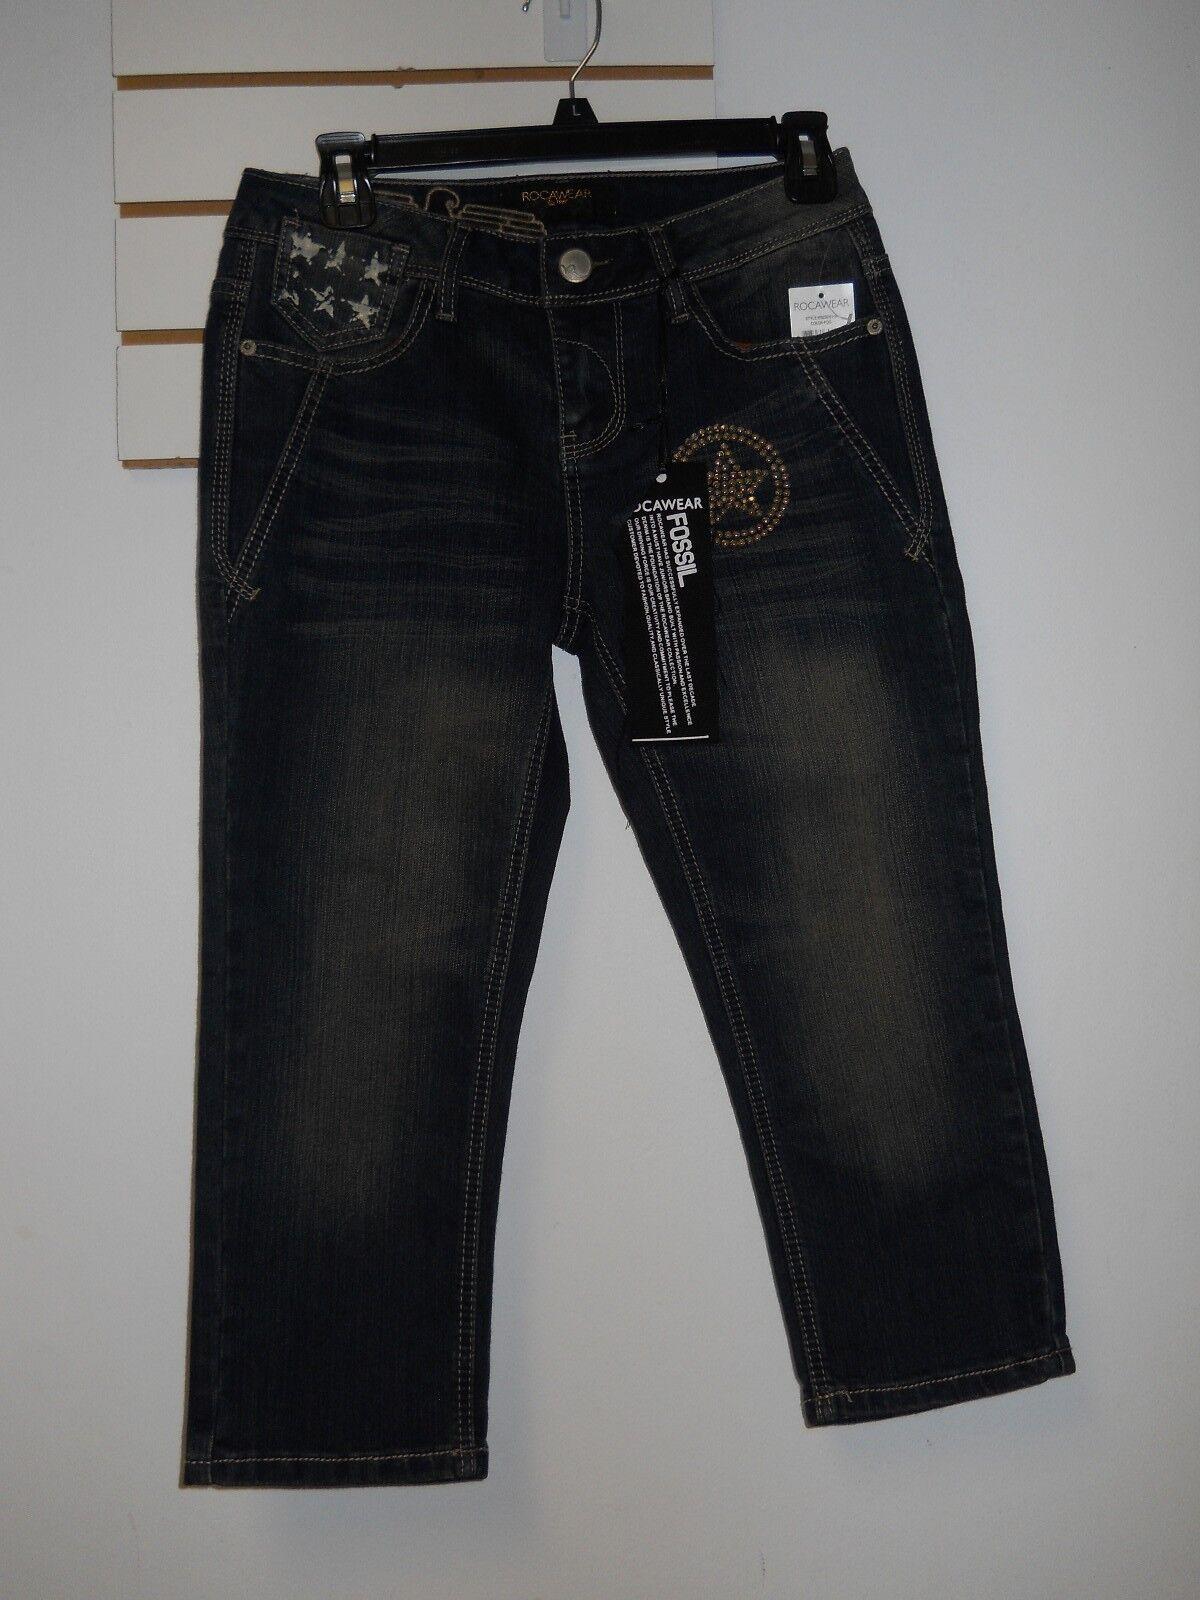 Roca Wear New Womens Dark bluee Jeans Capris 7 Juniors NWT